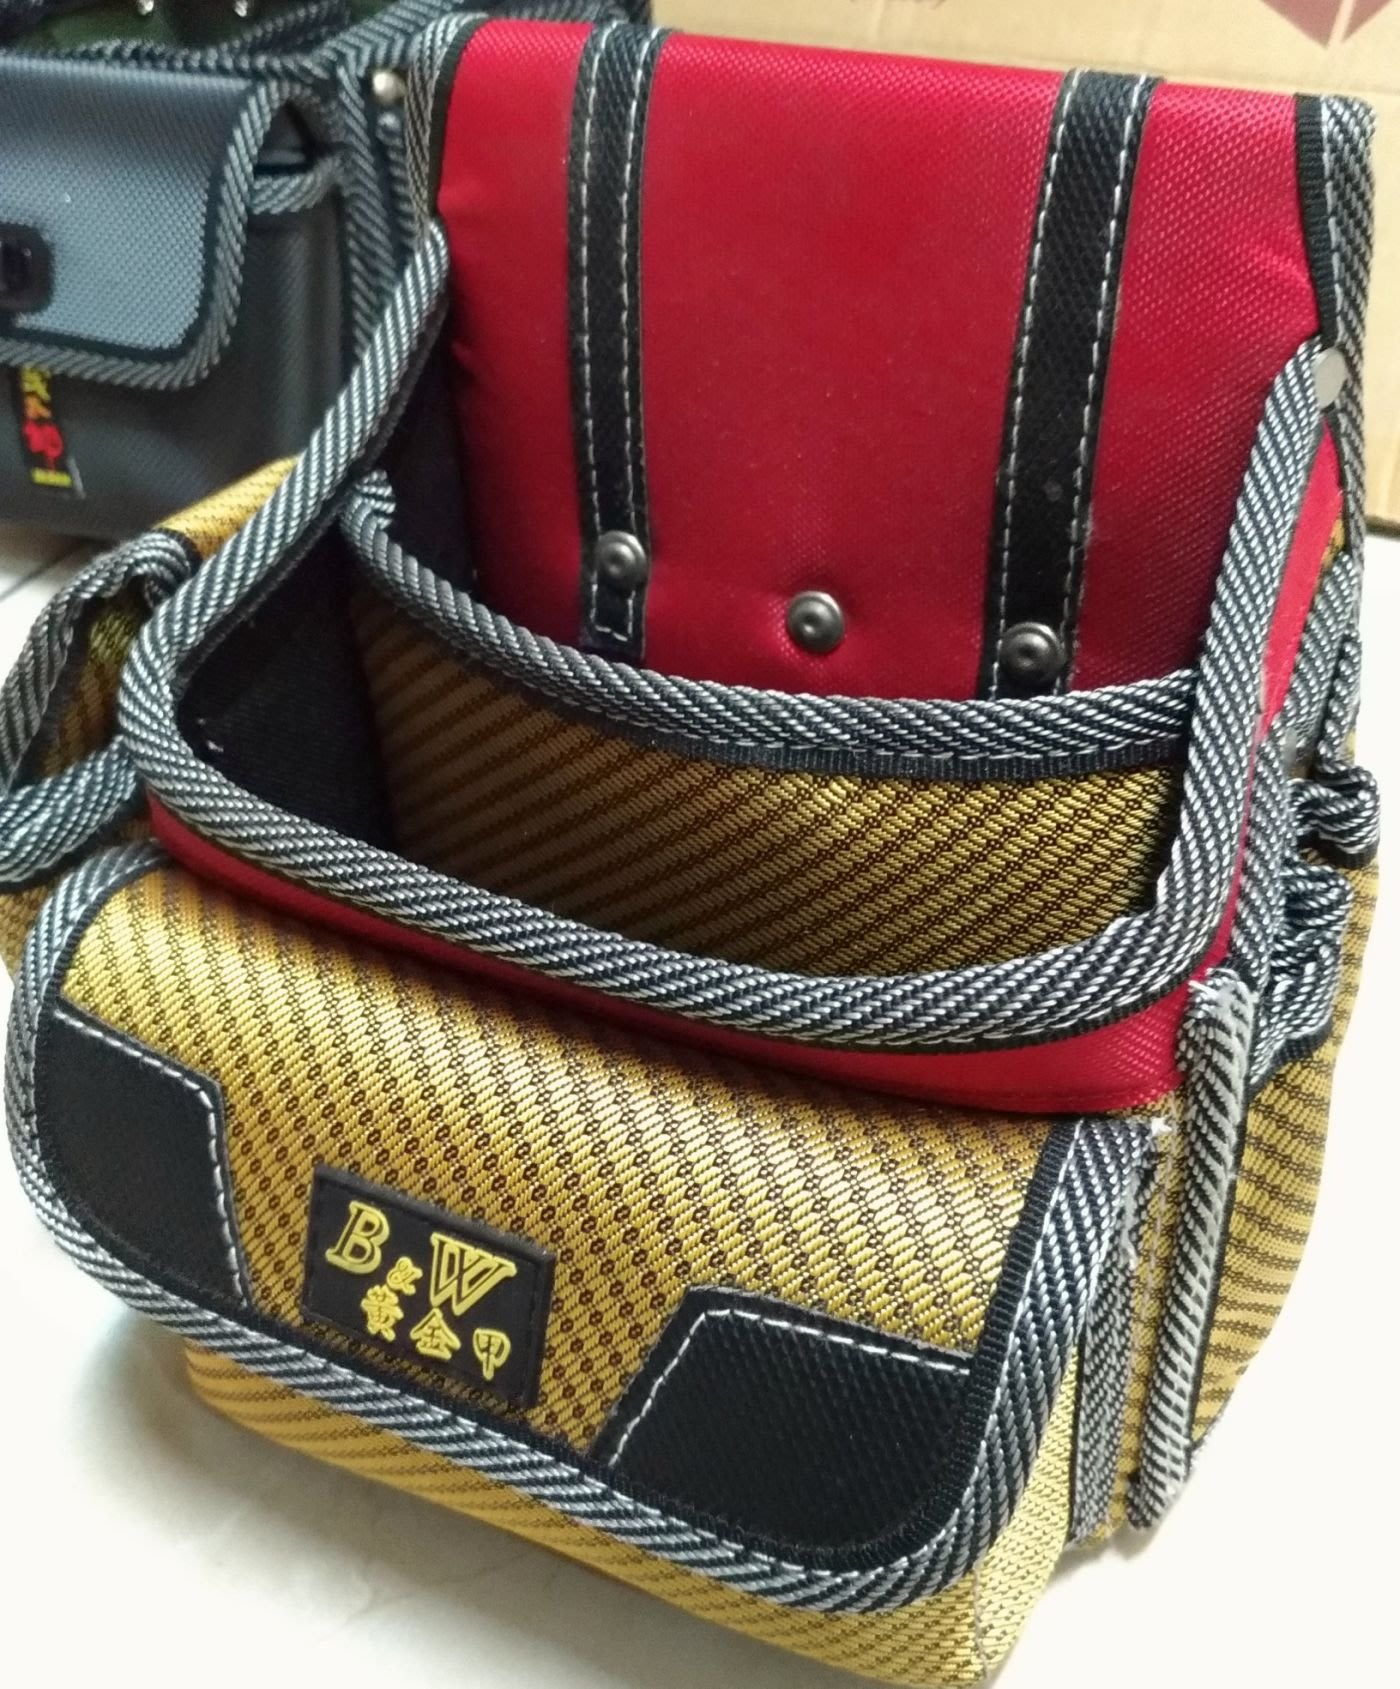 [CK五金小舖] B&W BW-618 黃金甲 釘袋 工具包 工具袋